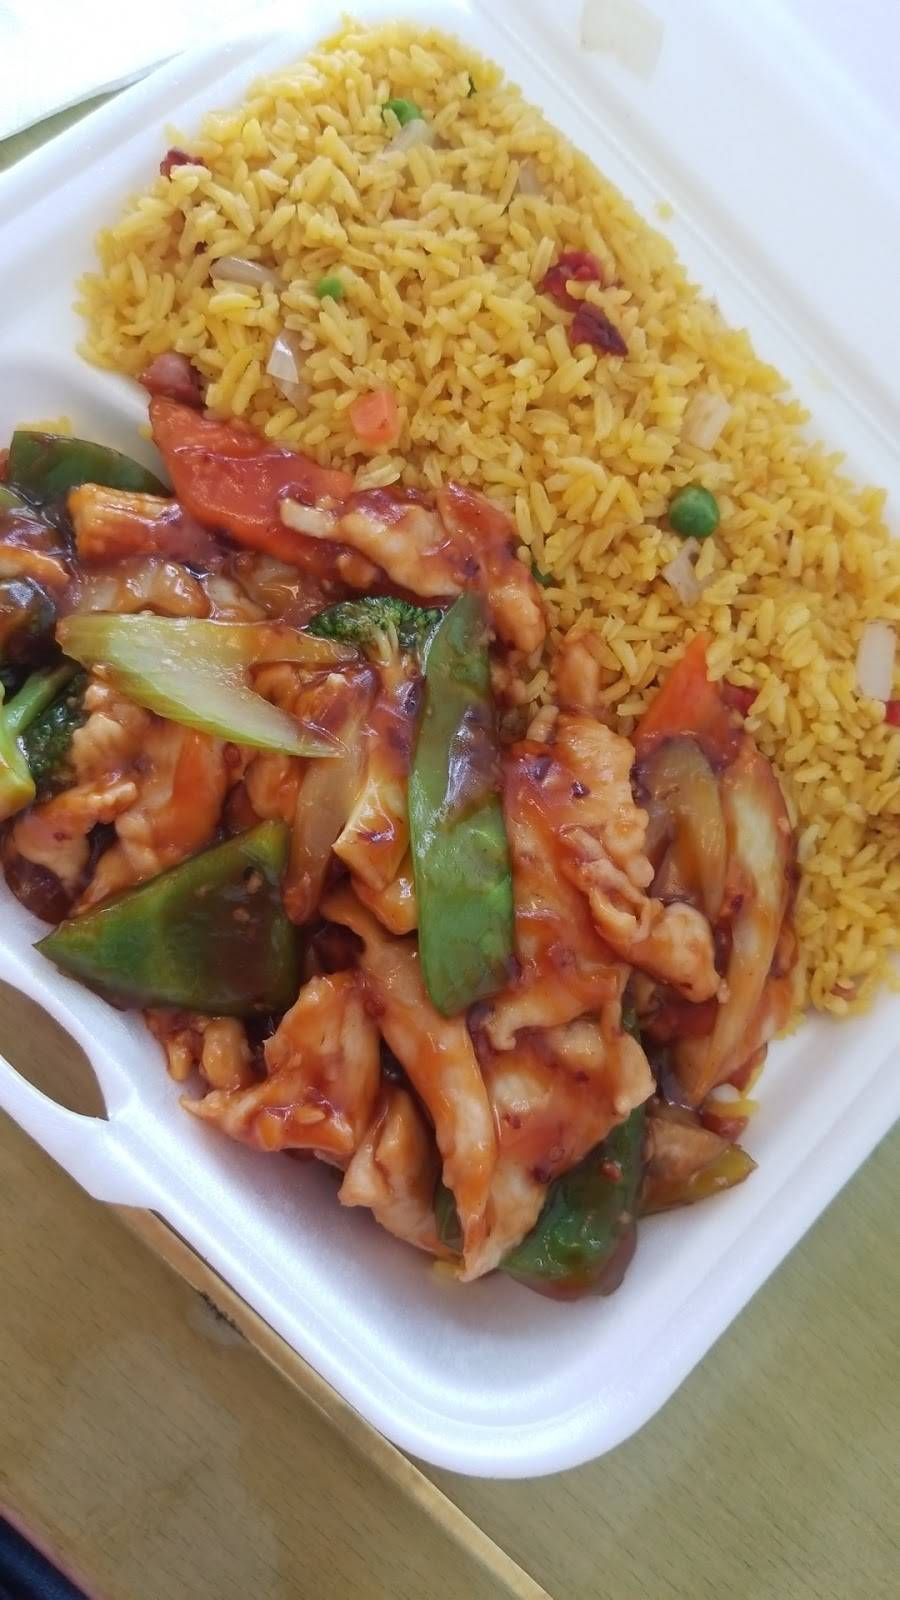 China Taste | restaurant | 876 E Tarpon Ave, Tarpon Springs, FL 34689, USA | 7279386688 OR +1 727-938-6688